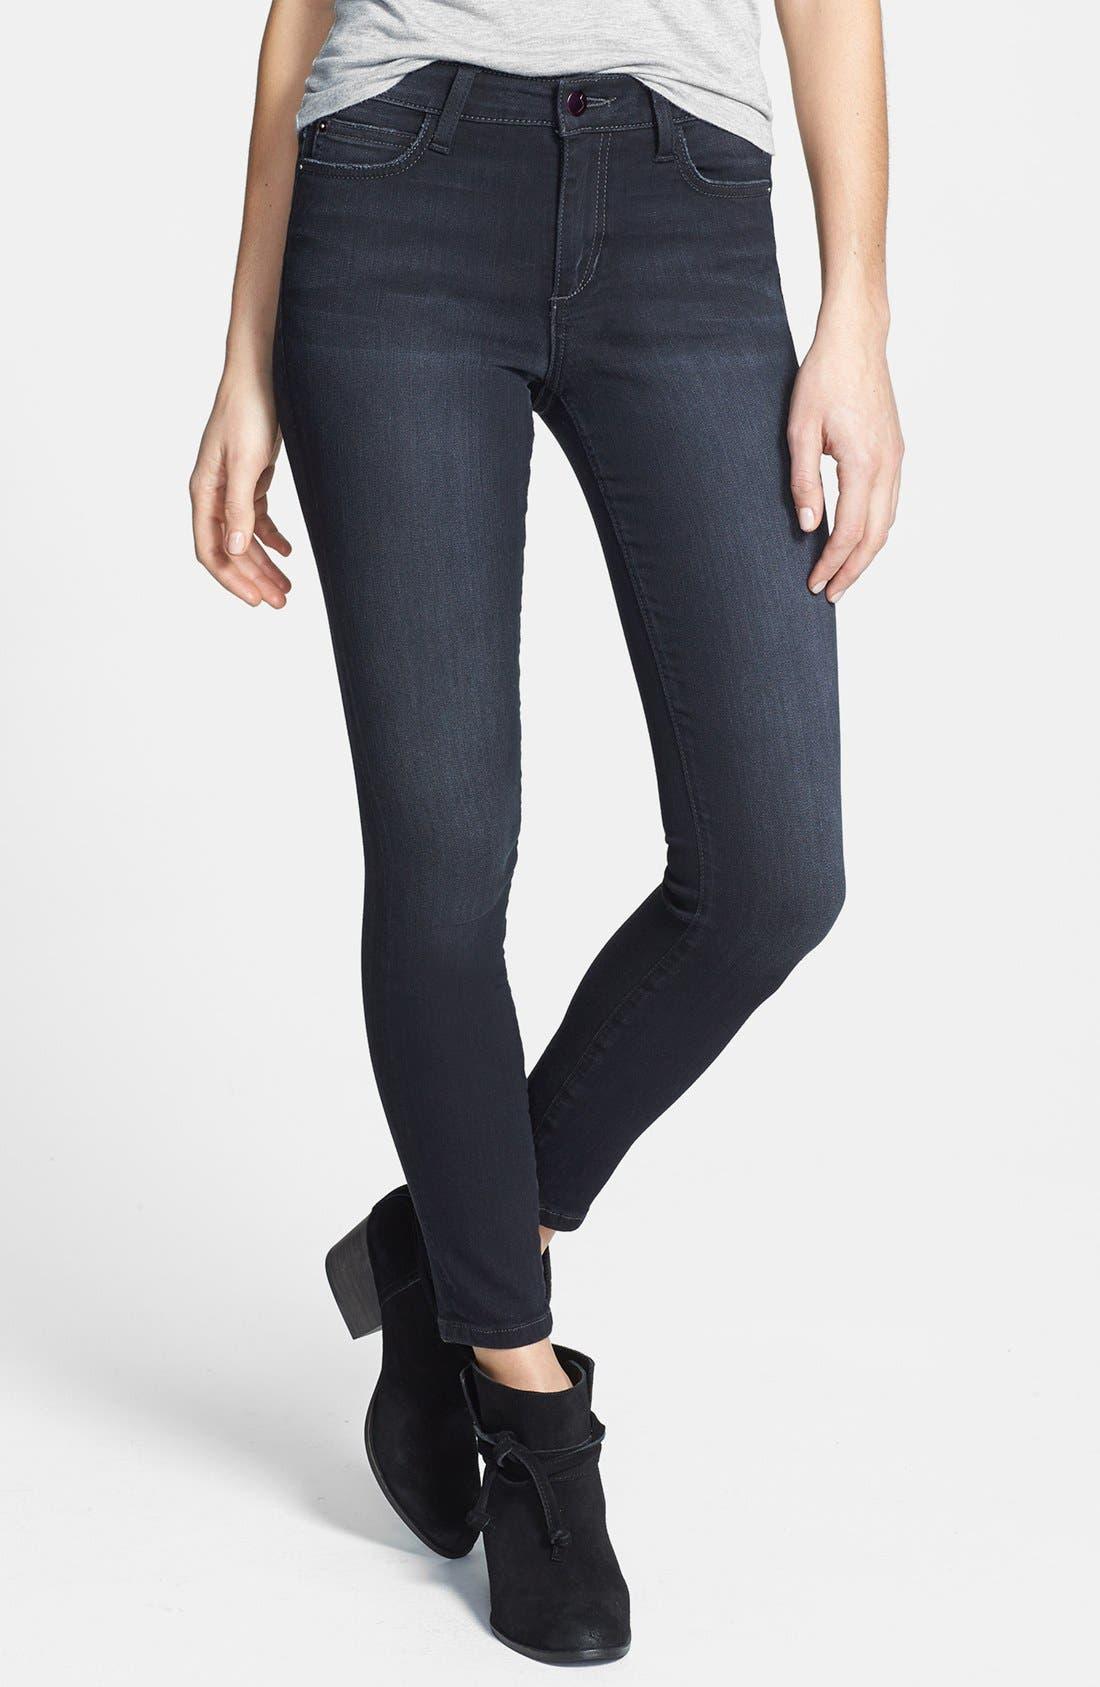 Alternate Image 1 Selected - Joe's 'Beckie' Stretch Skinny Jeans